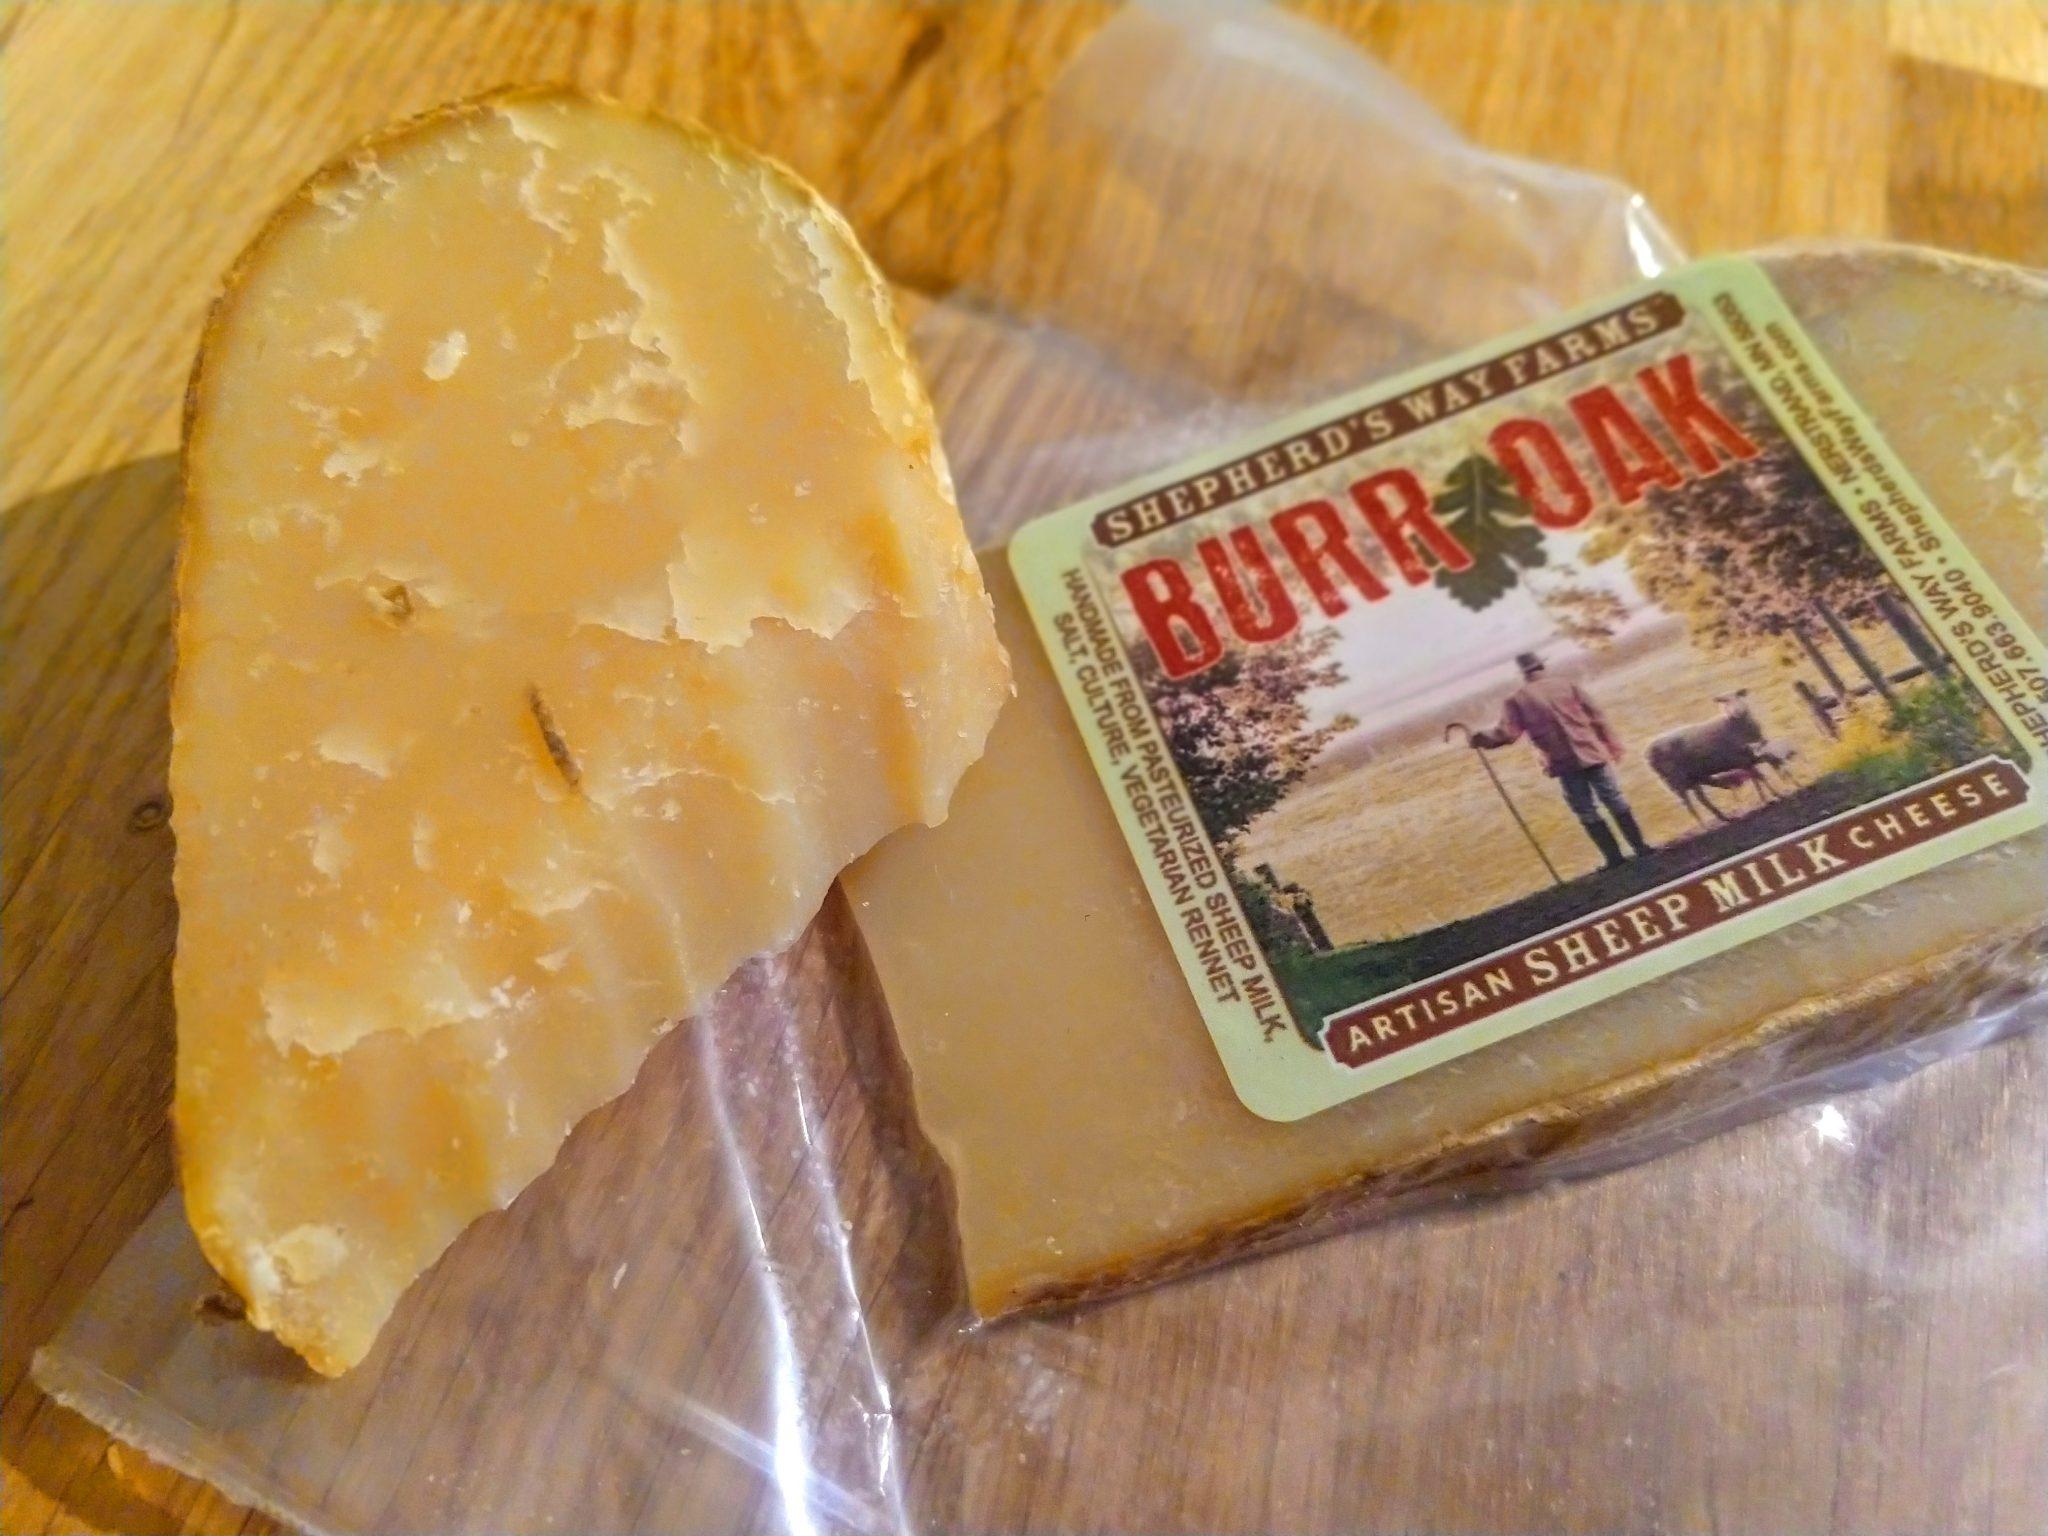 Shepherds Way Burr Oak Squash and Cheese Dip